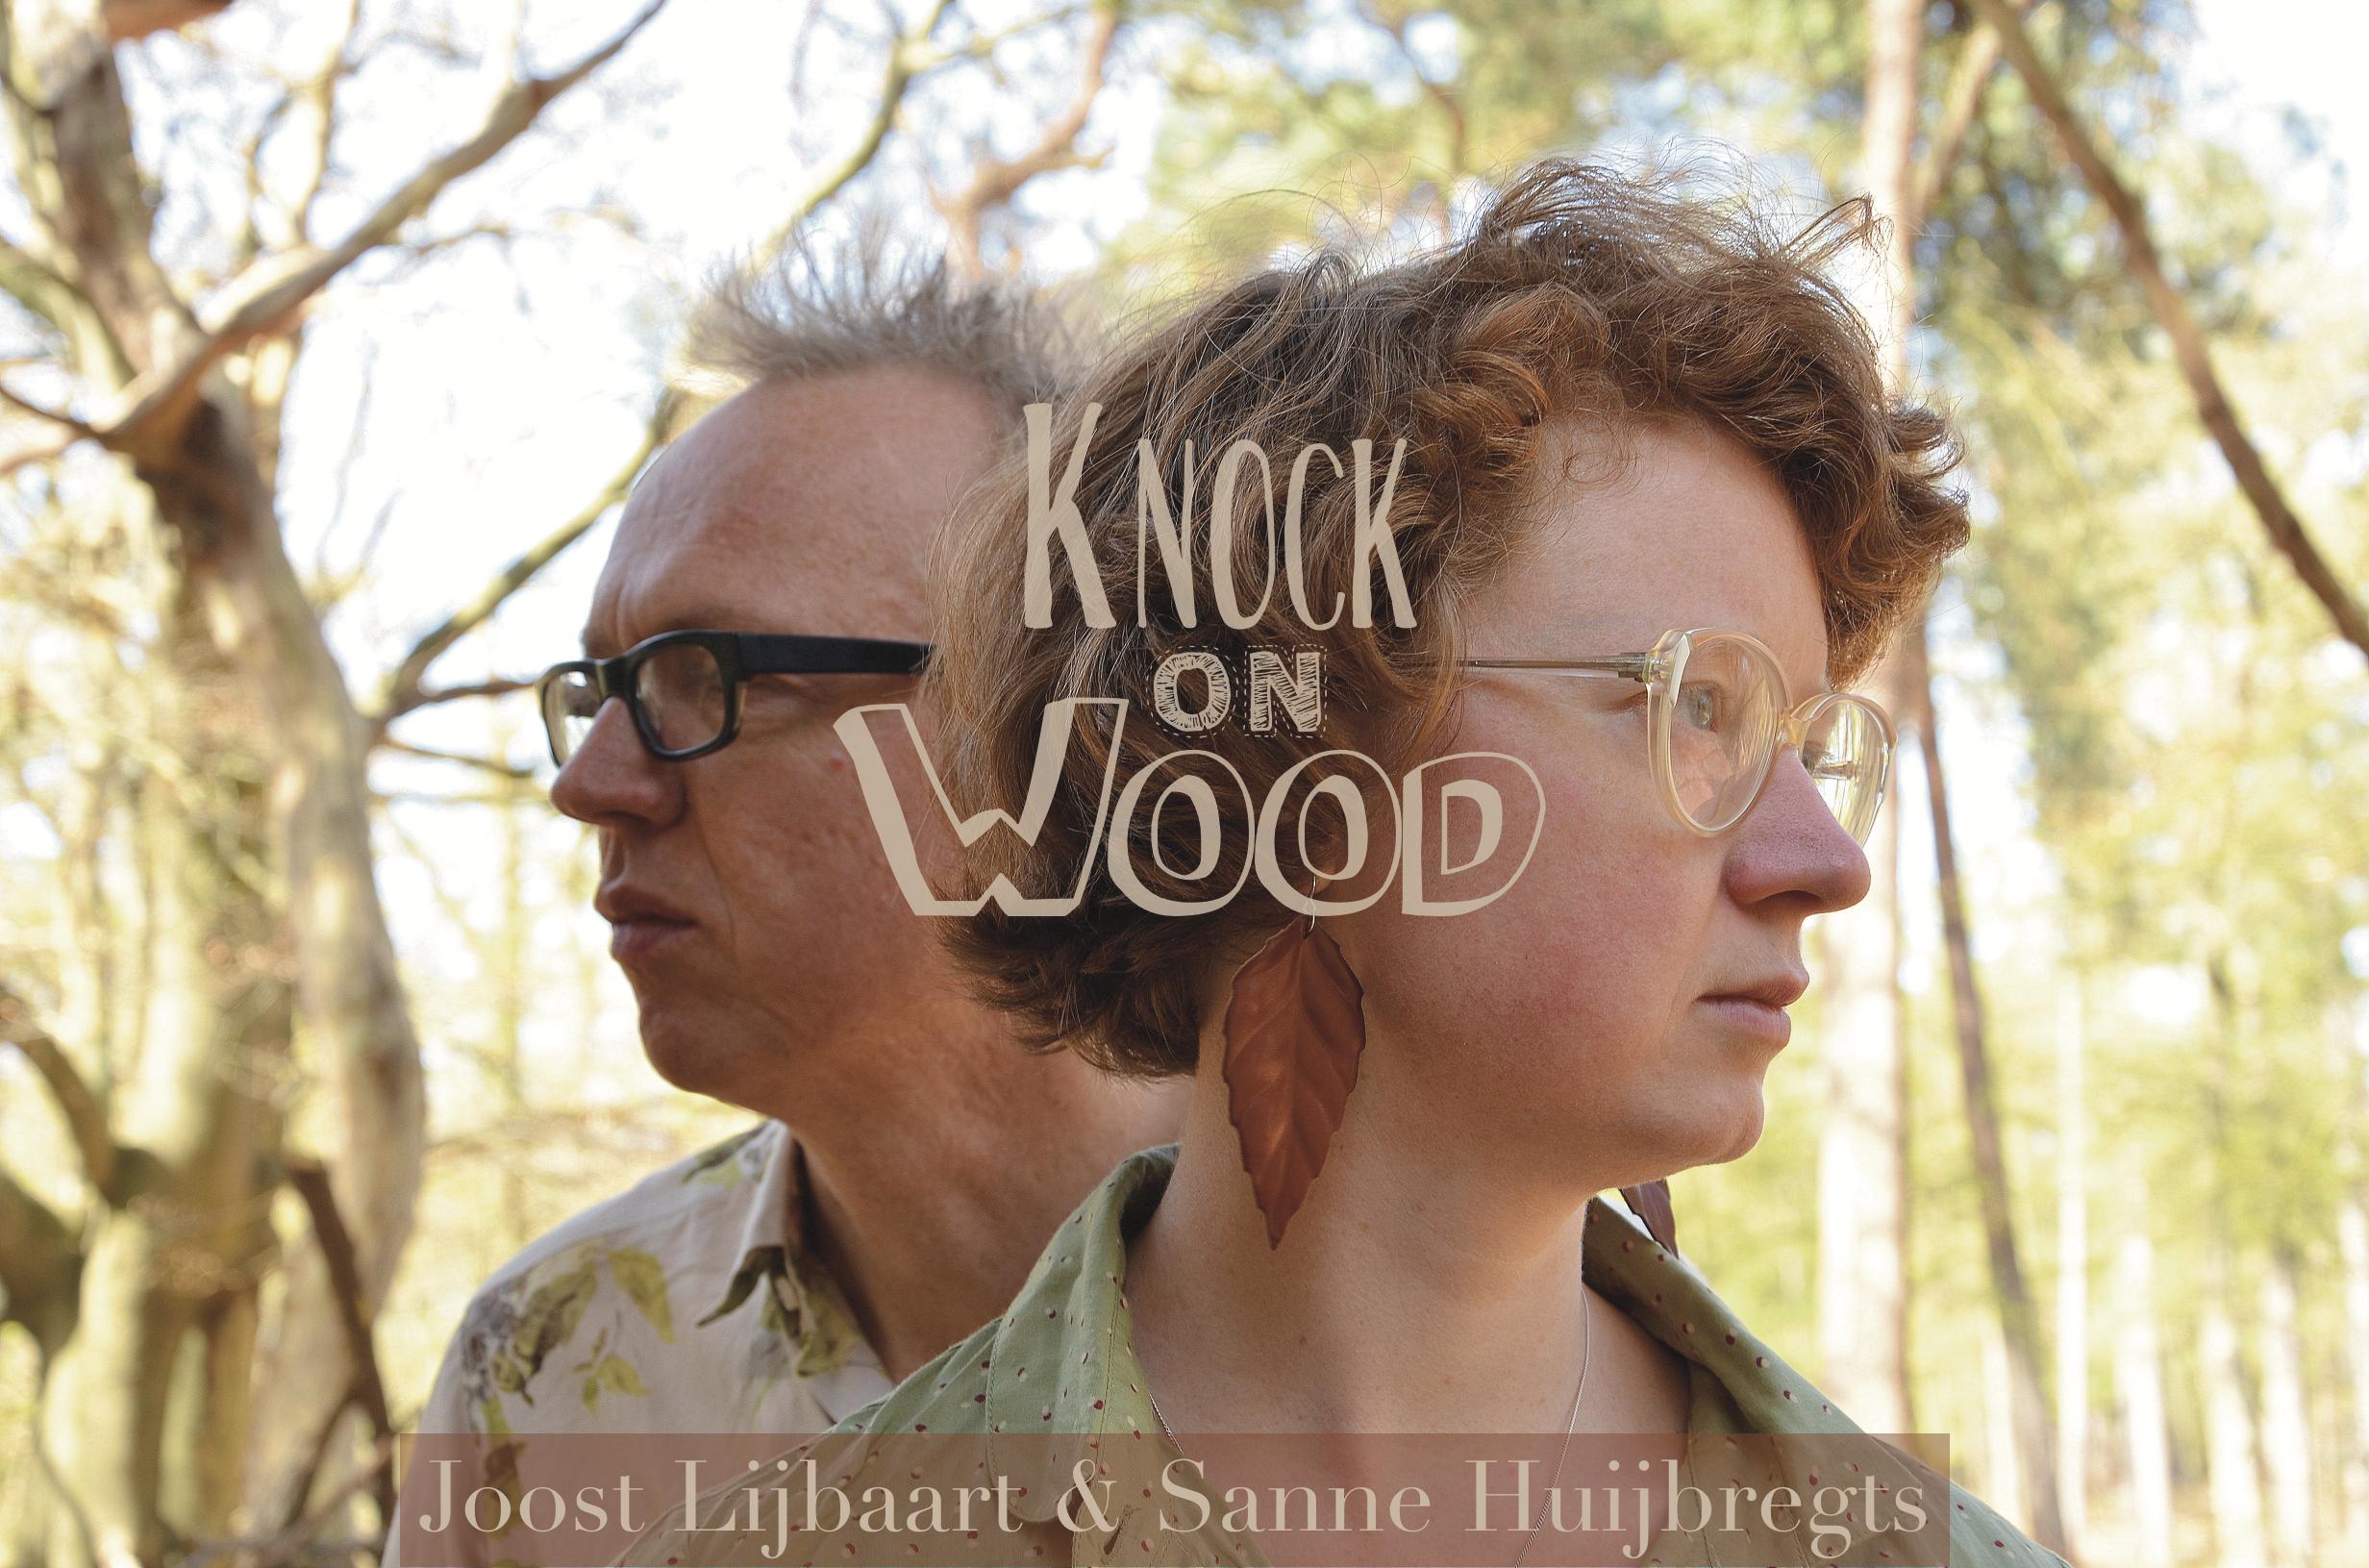 Knock On Wood Sanne Huijbregts Joost Lijbaart